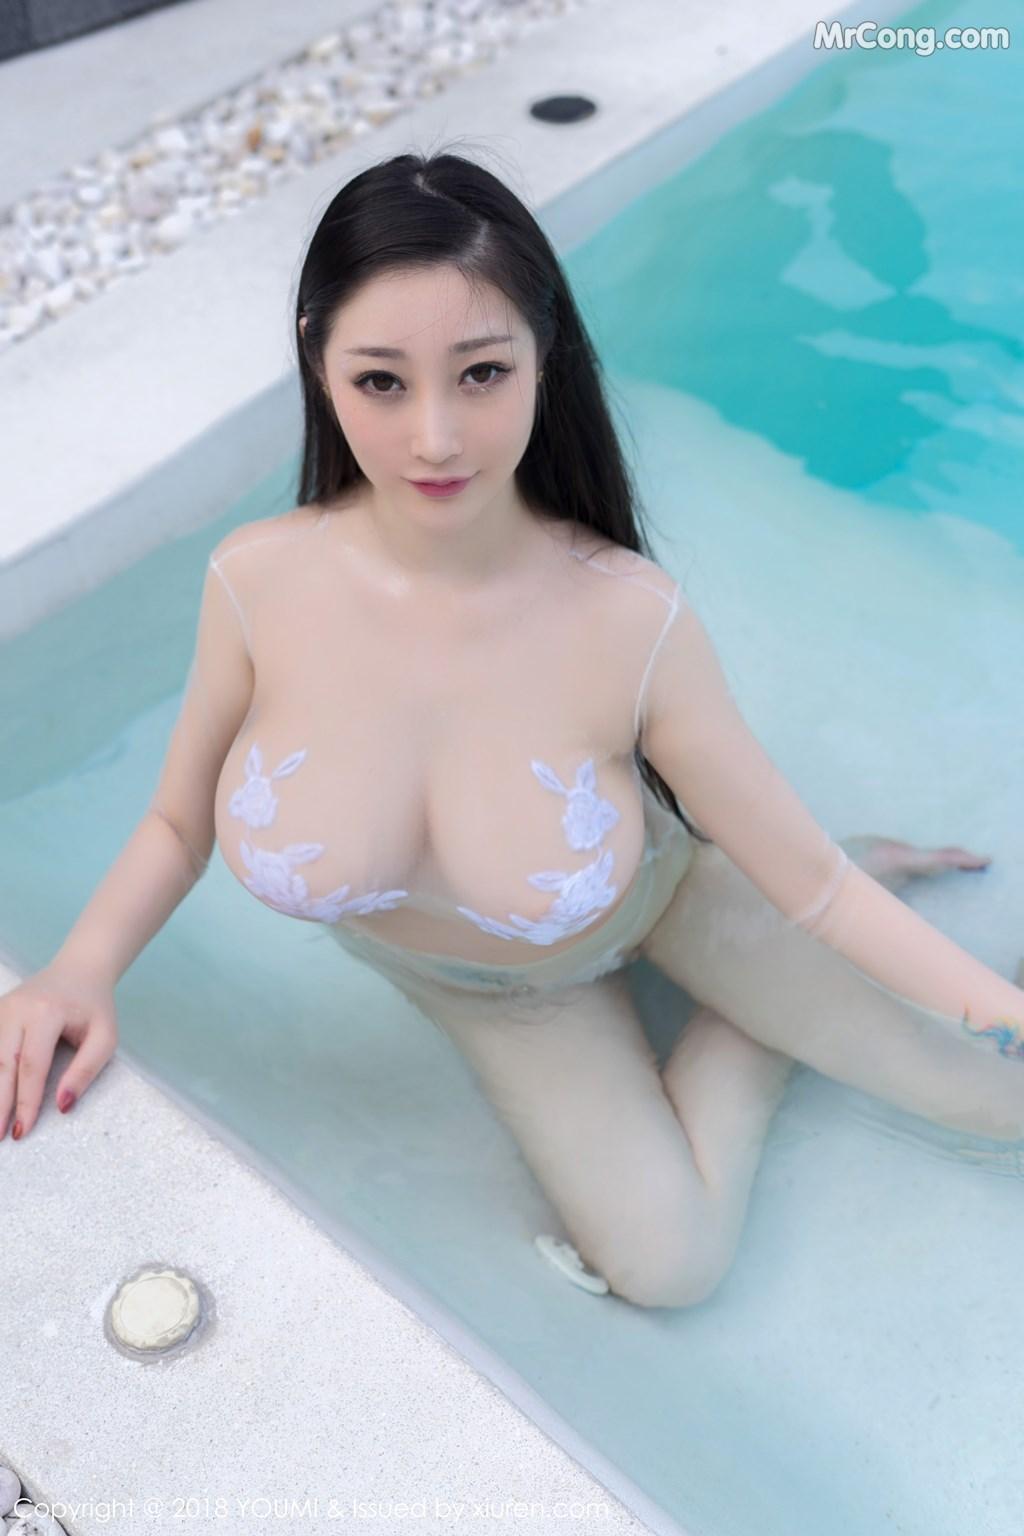 Image YouMi-Vol.183-Daji-Toxic-MrCong.com-001 in post YouMi Vol.183: Người mẫu Daji_Toxic (妲己_Toxic) (46 ảnh)